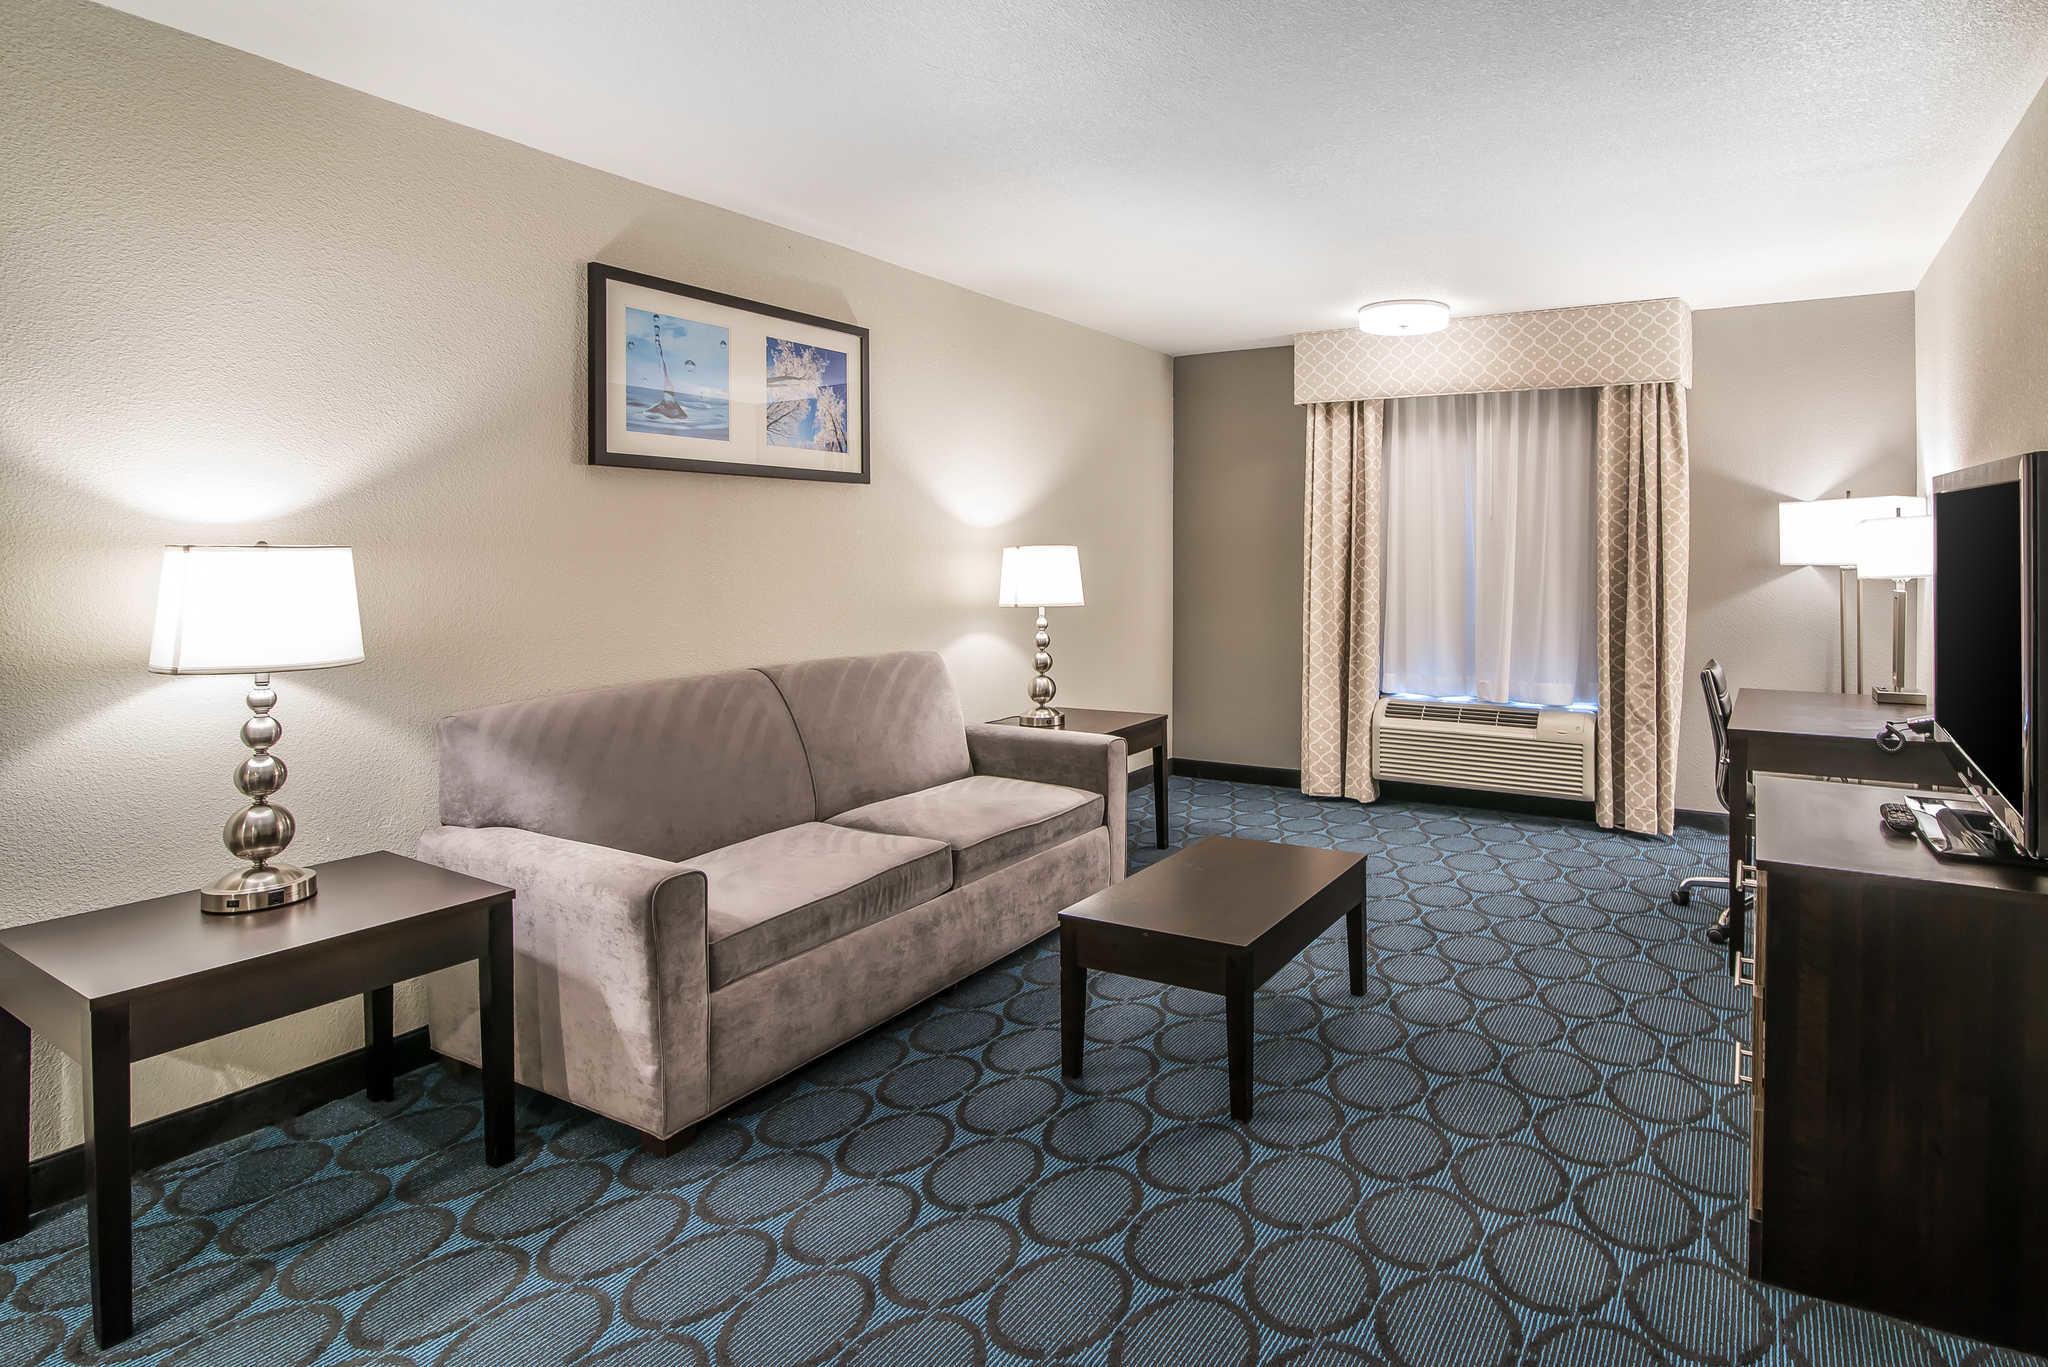 Quality Inn & Suites - Ruidoso Hwy 70 image 20